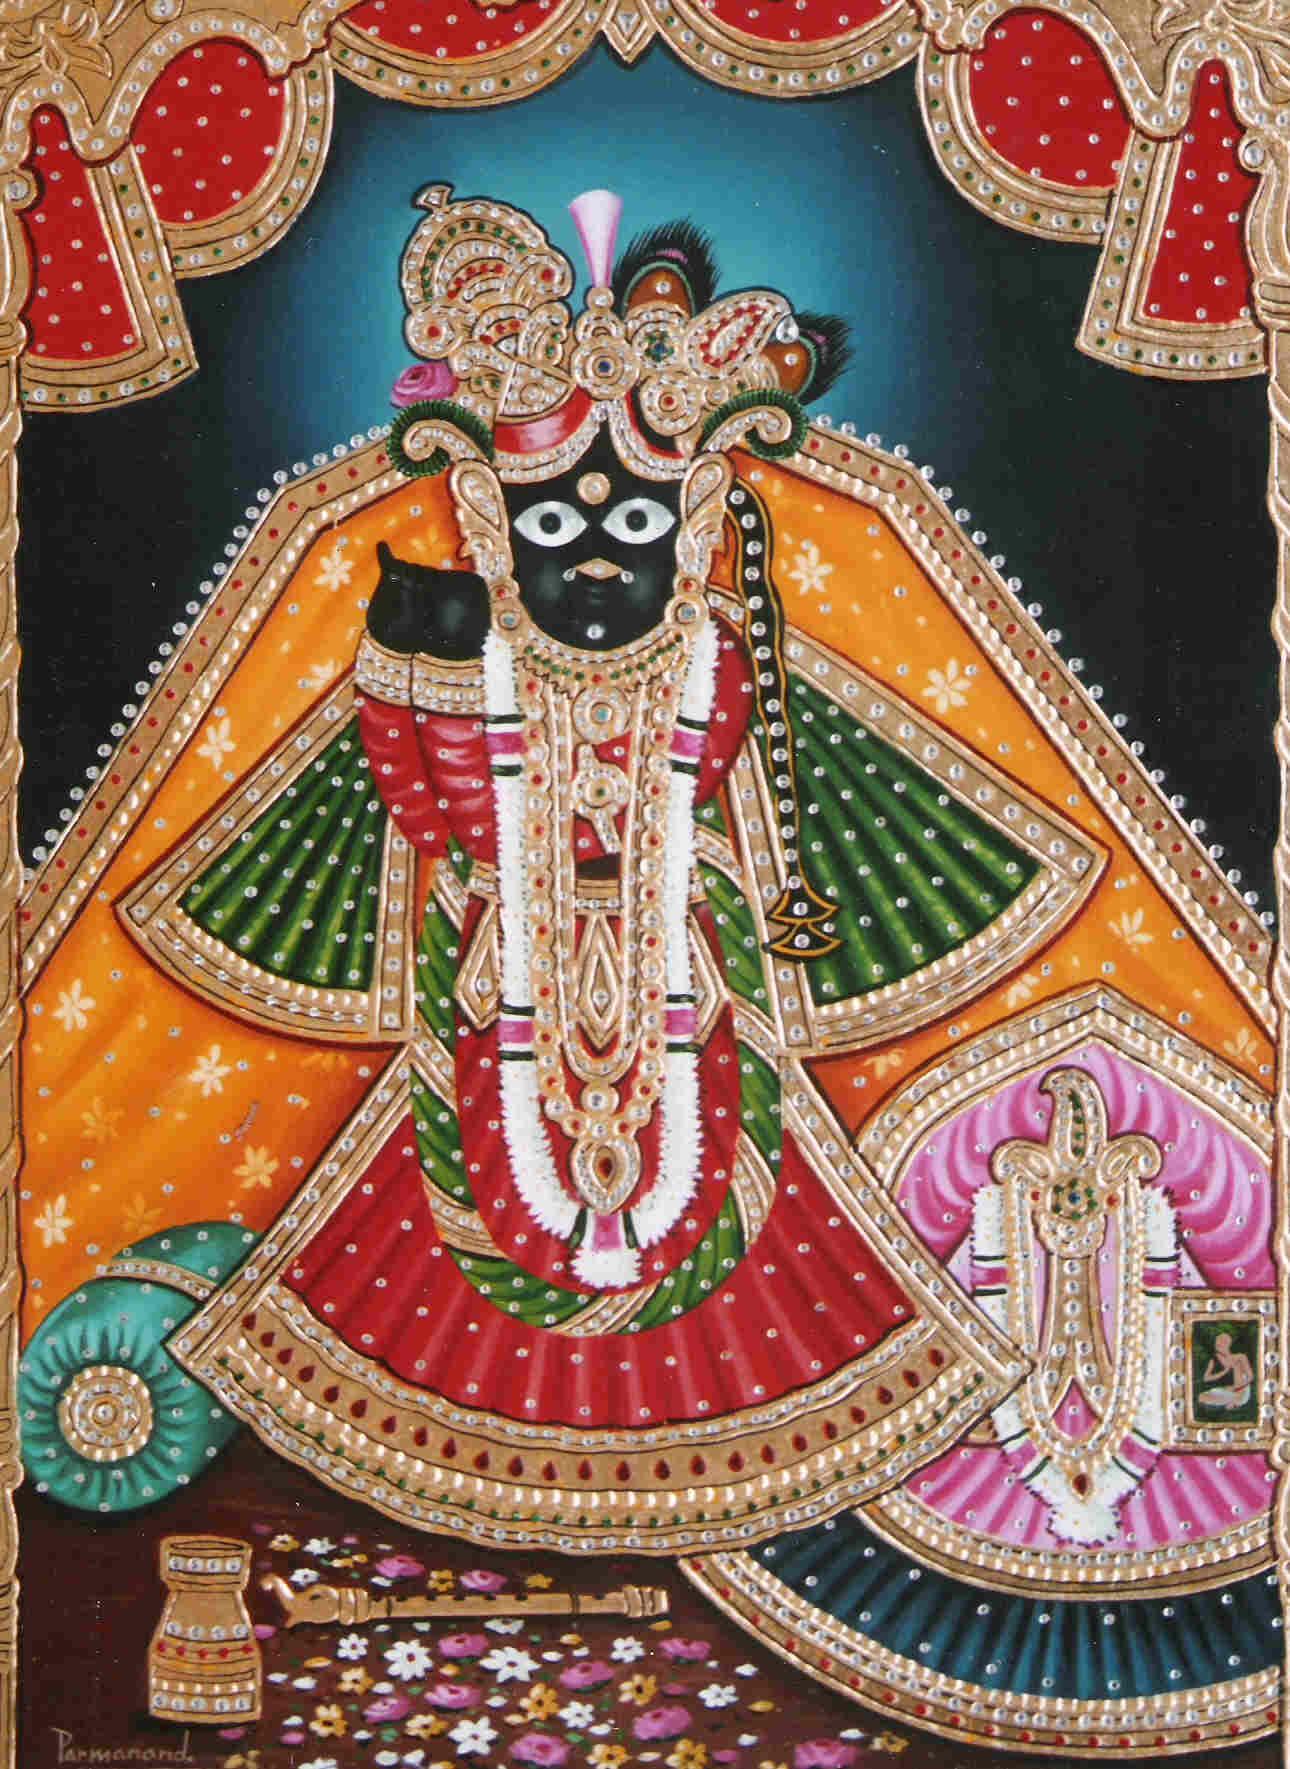 Shri Banke Bihari Ji Shri Bankey Bihari Temple Vrindavan